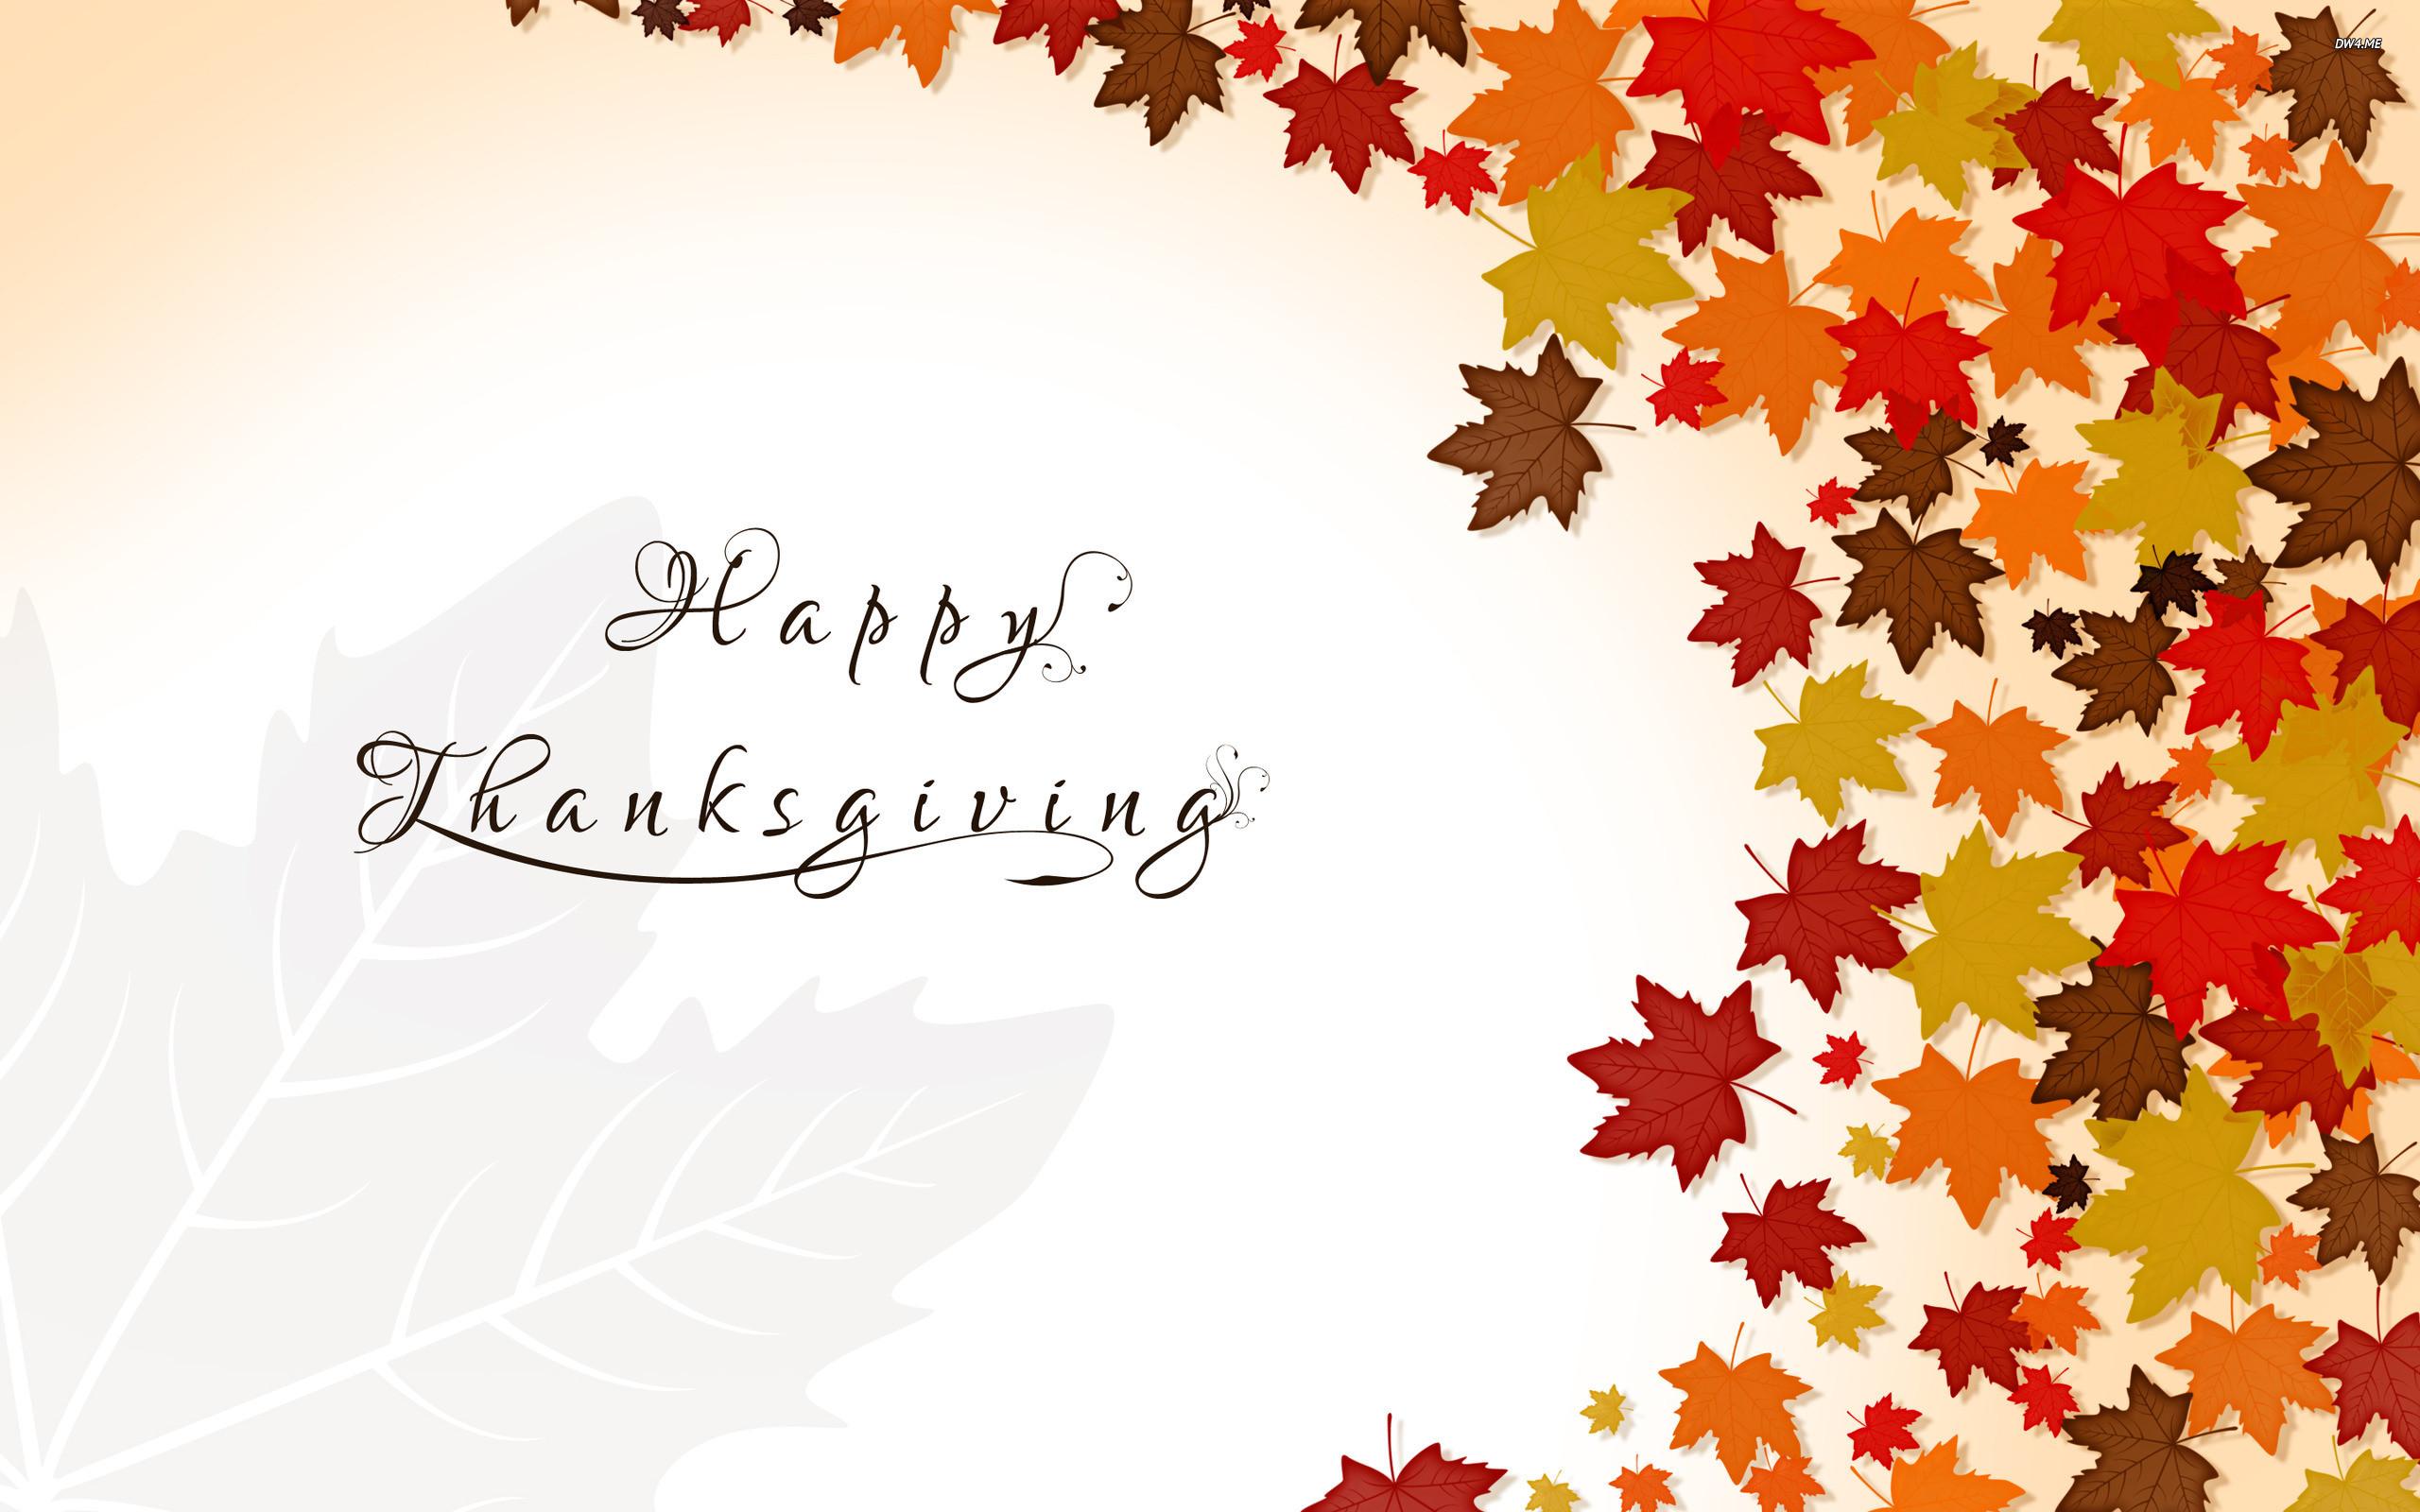 thanksgiving wallpapers greeting. Â«Â«